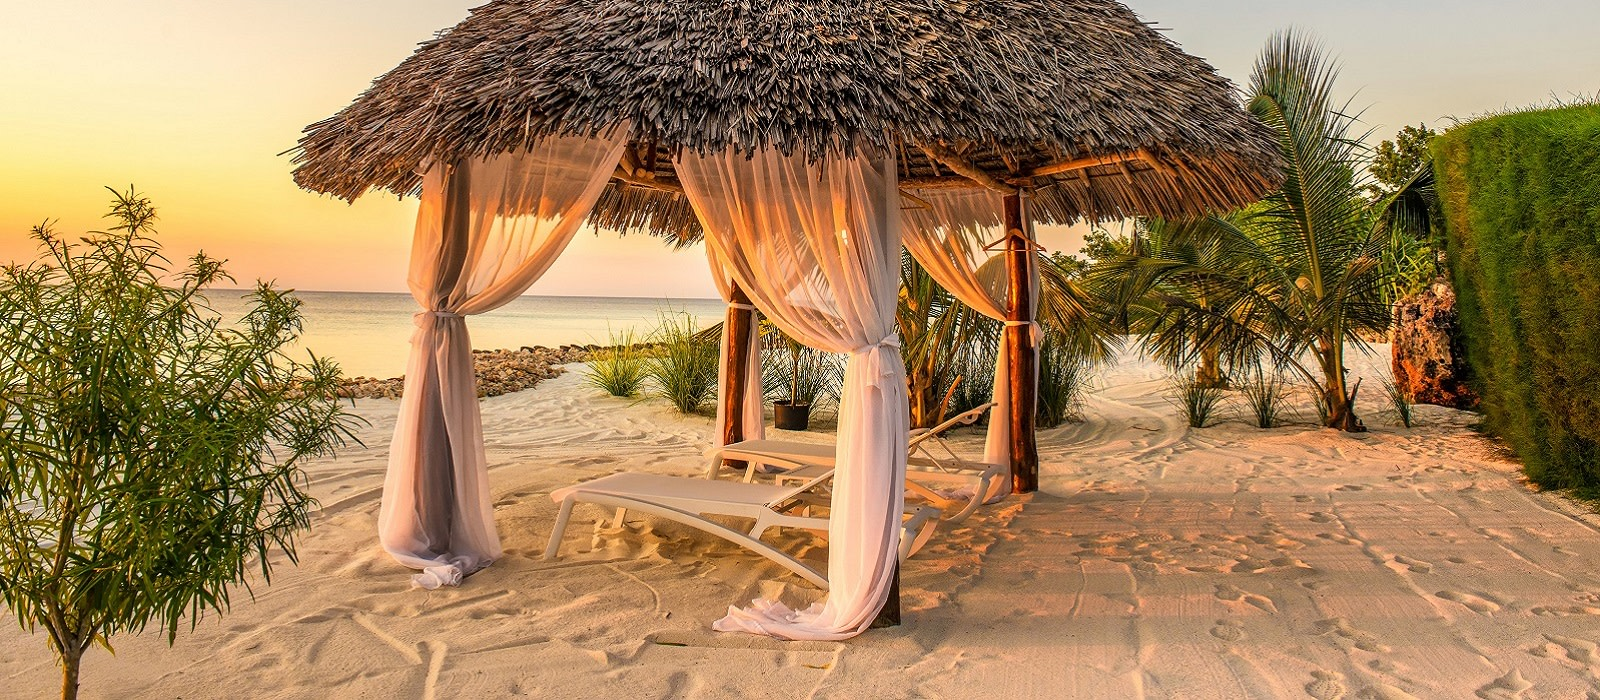 Beach lounge chairs at sunset at the shore of Indian ocean, Zanzibar, Tanzania, Africa Enchanting Travels